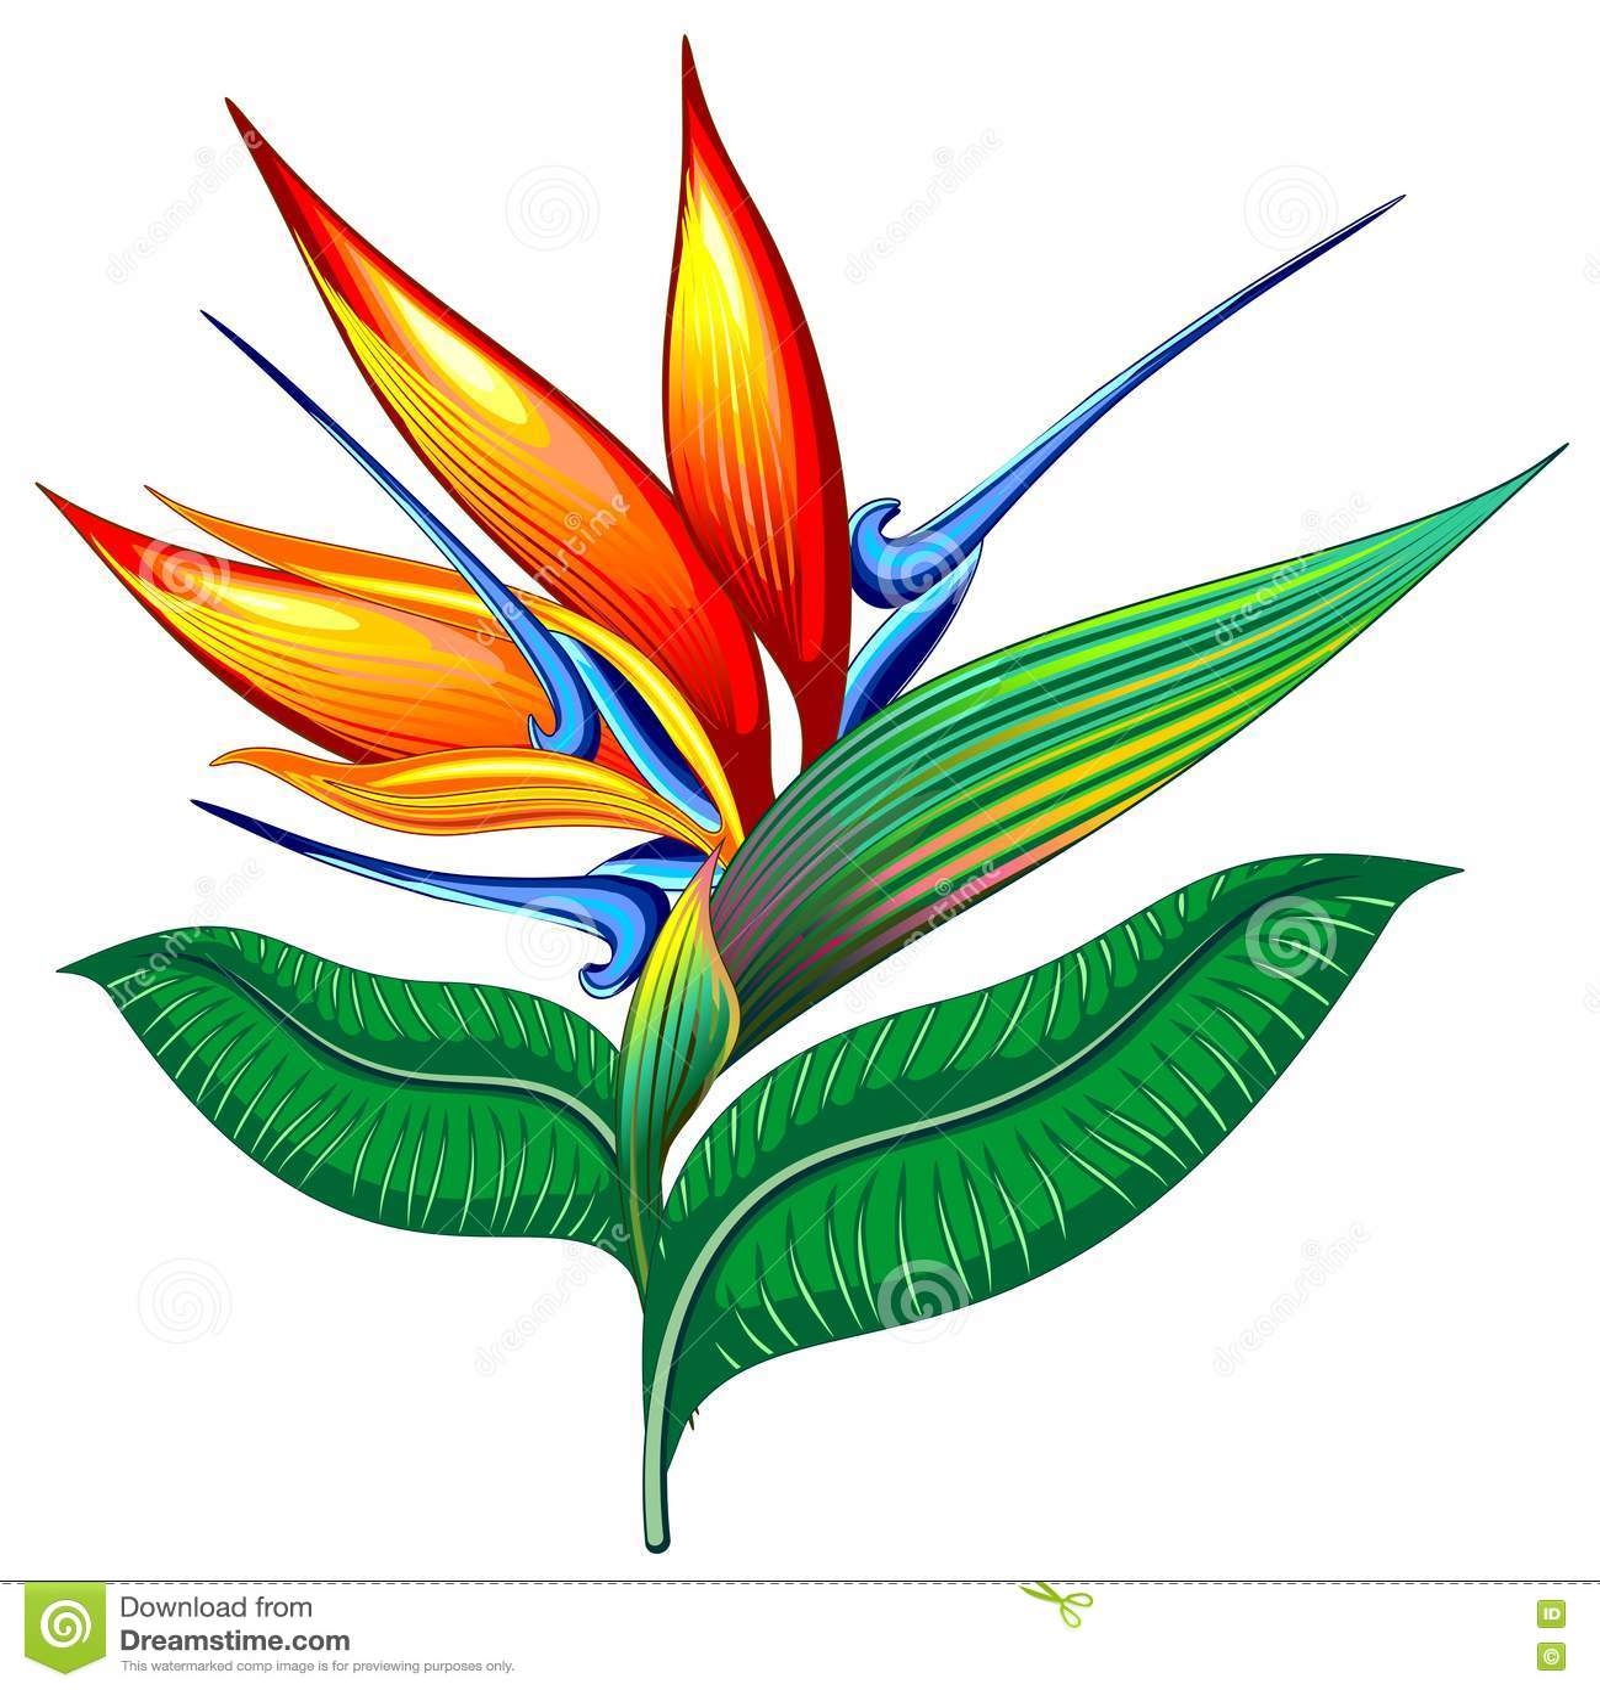 Bird of Paradise Flower, Exotic Botanical Vector illustration, Strelizia